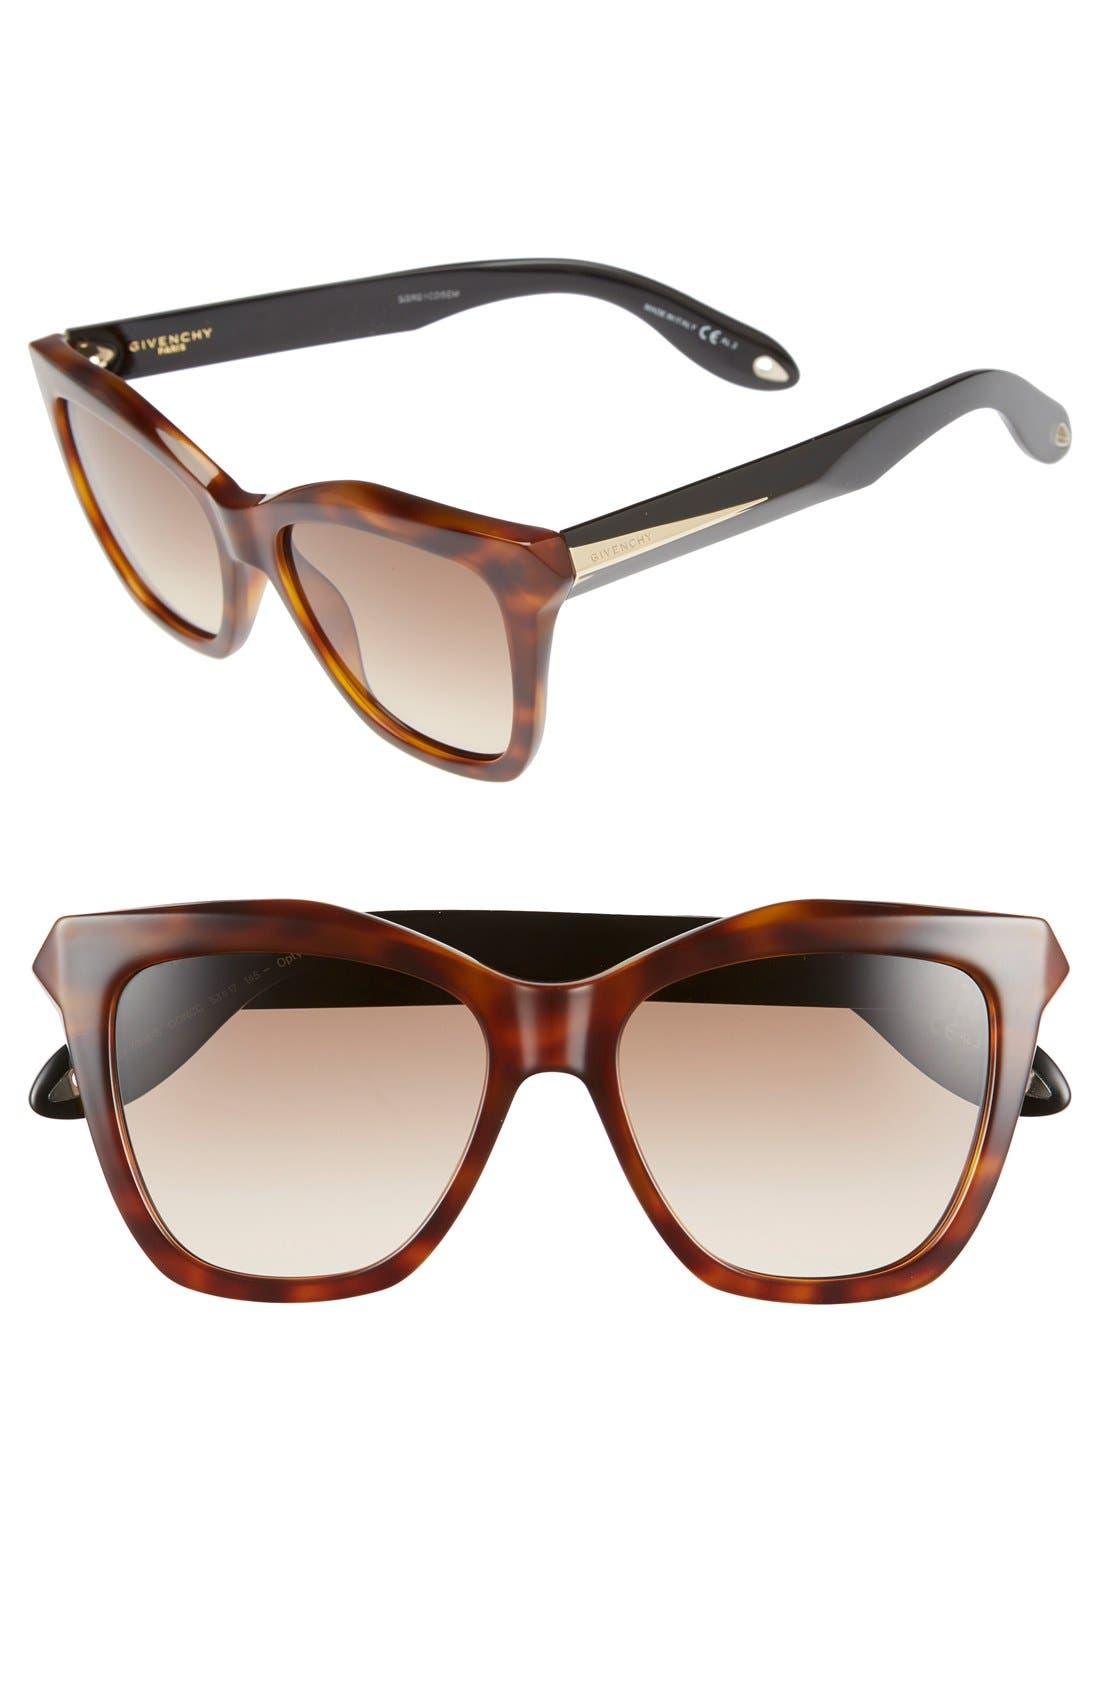 Givenchy 53mm Cat Eye Sunglasses